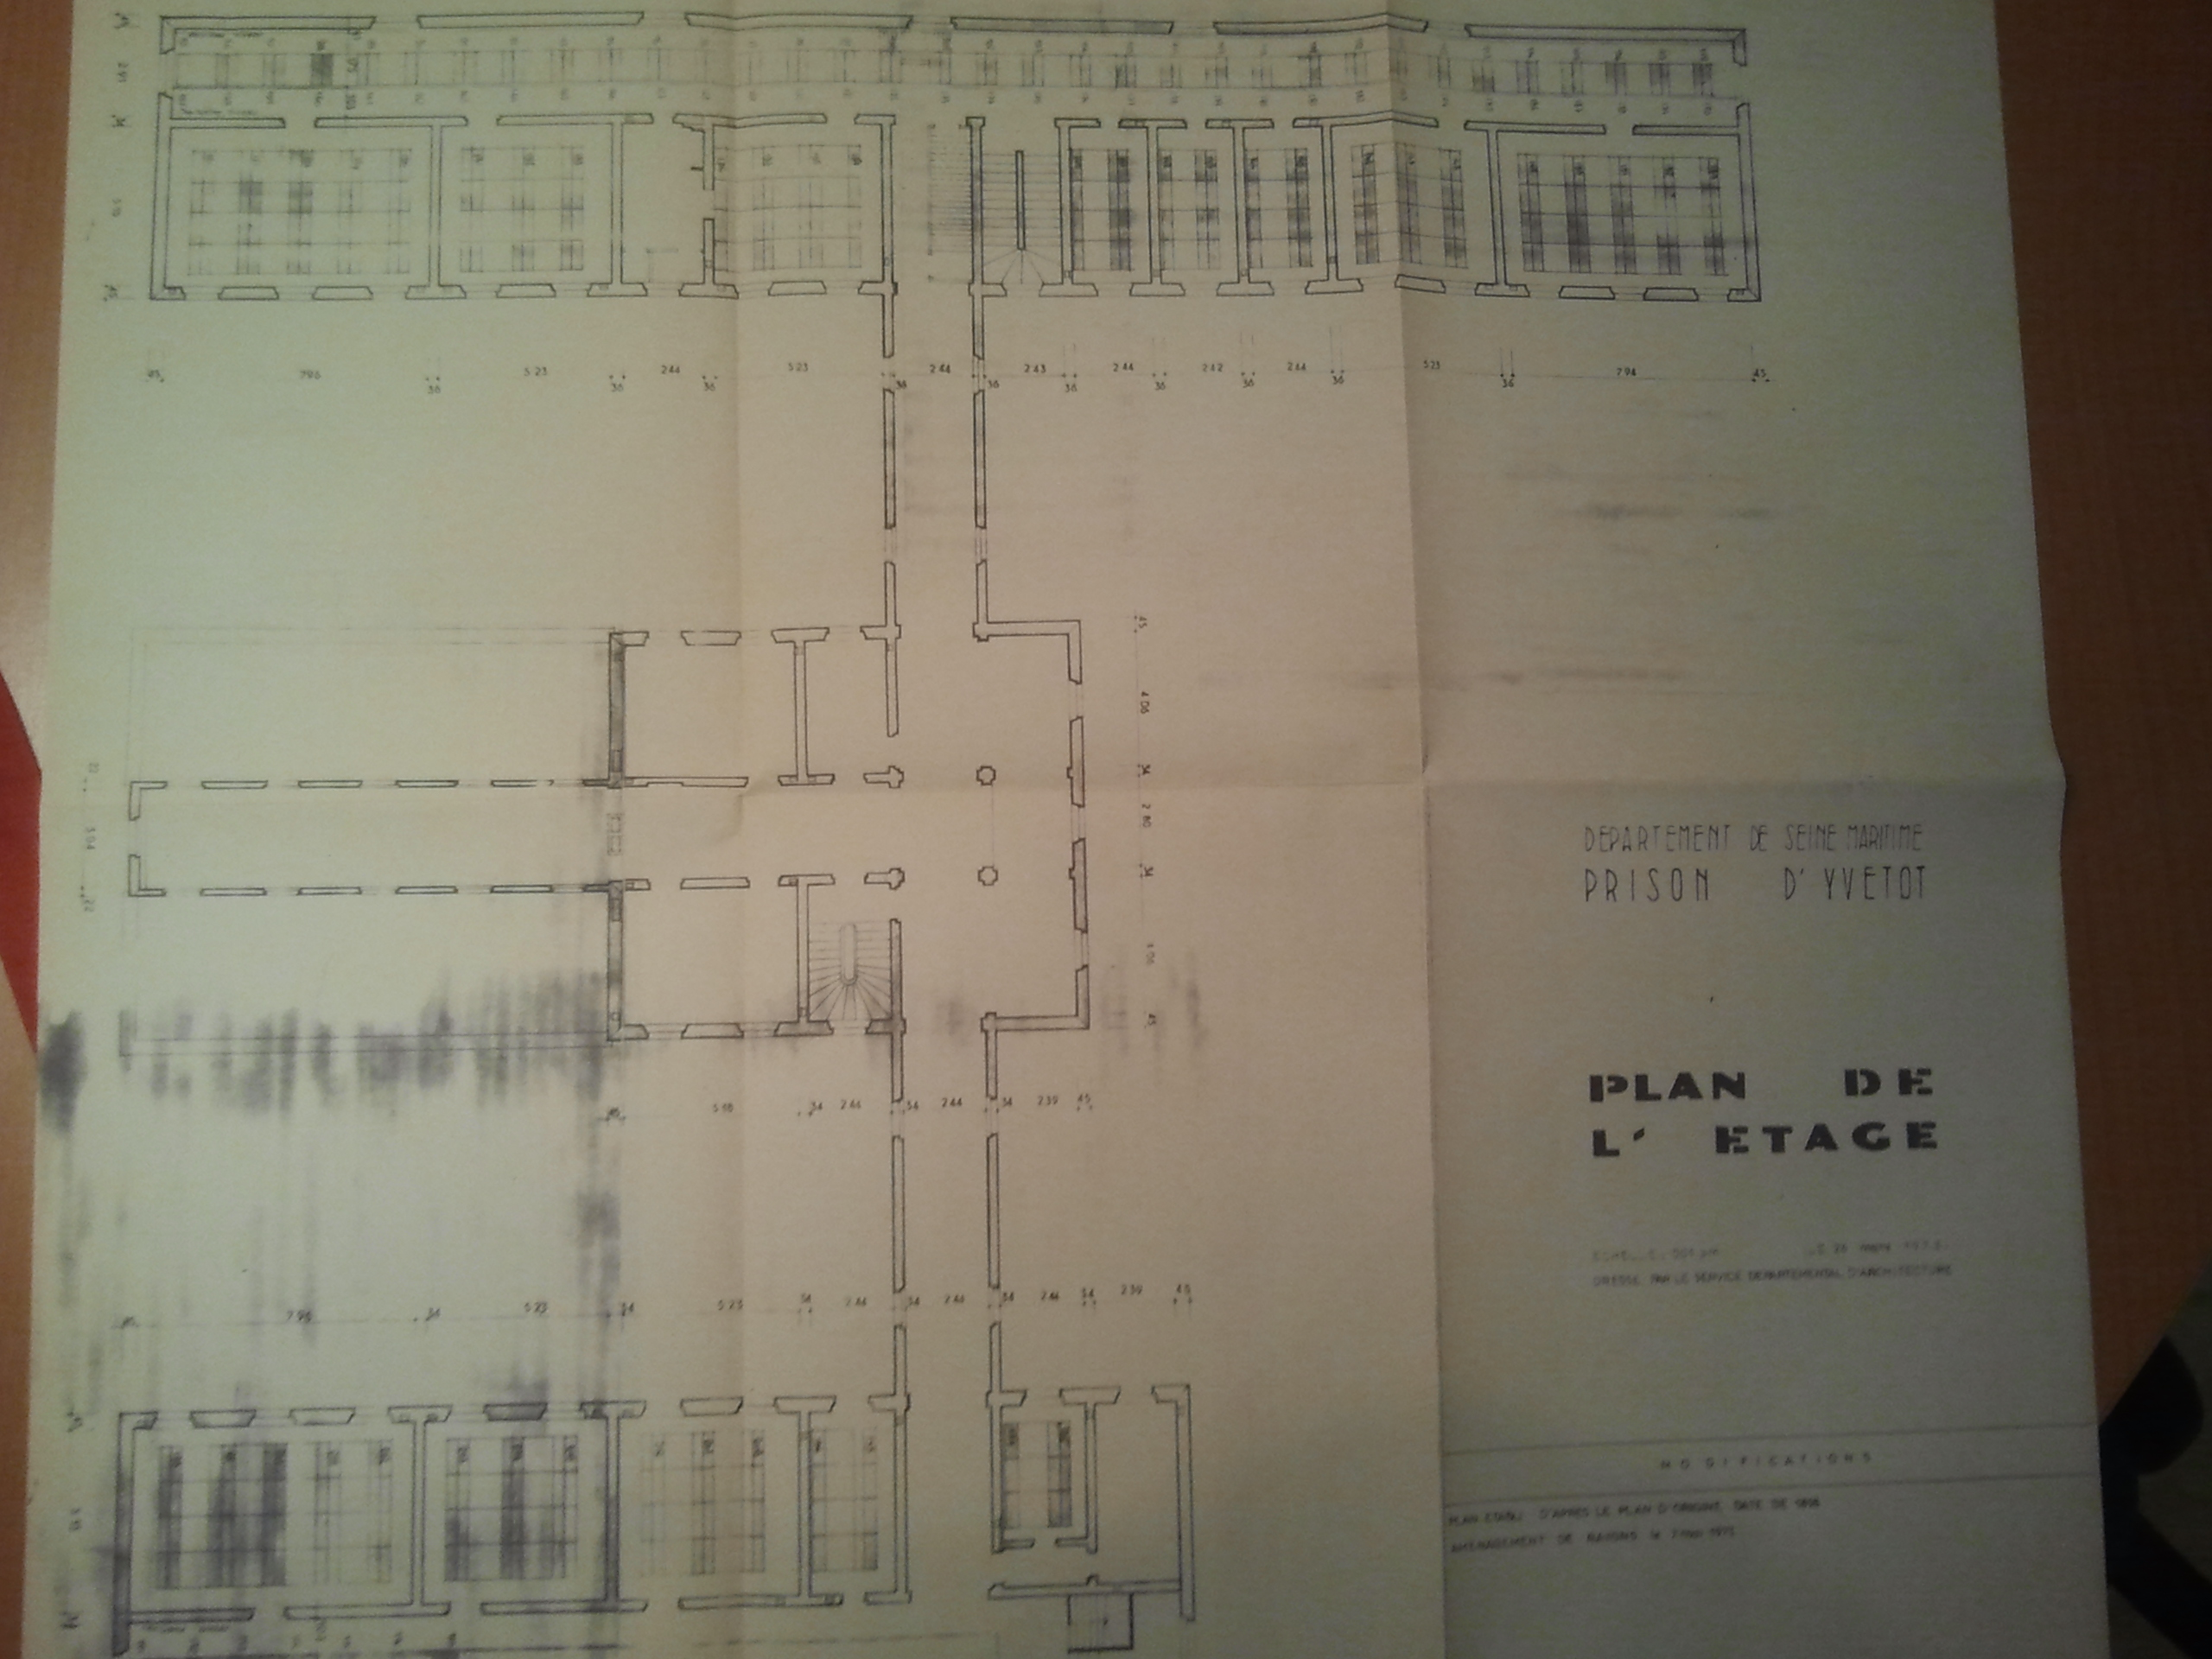 Source archives municipales dyvetot